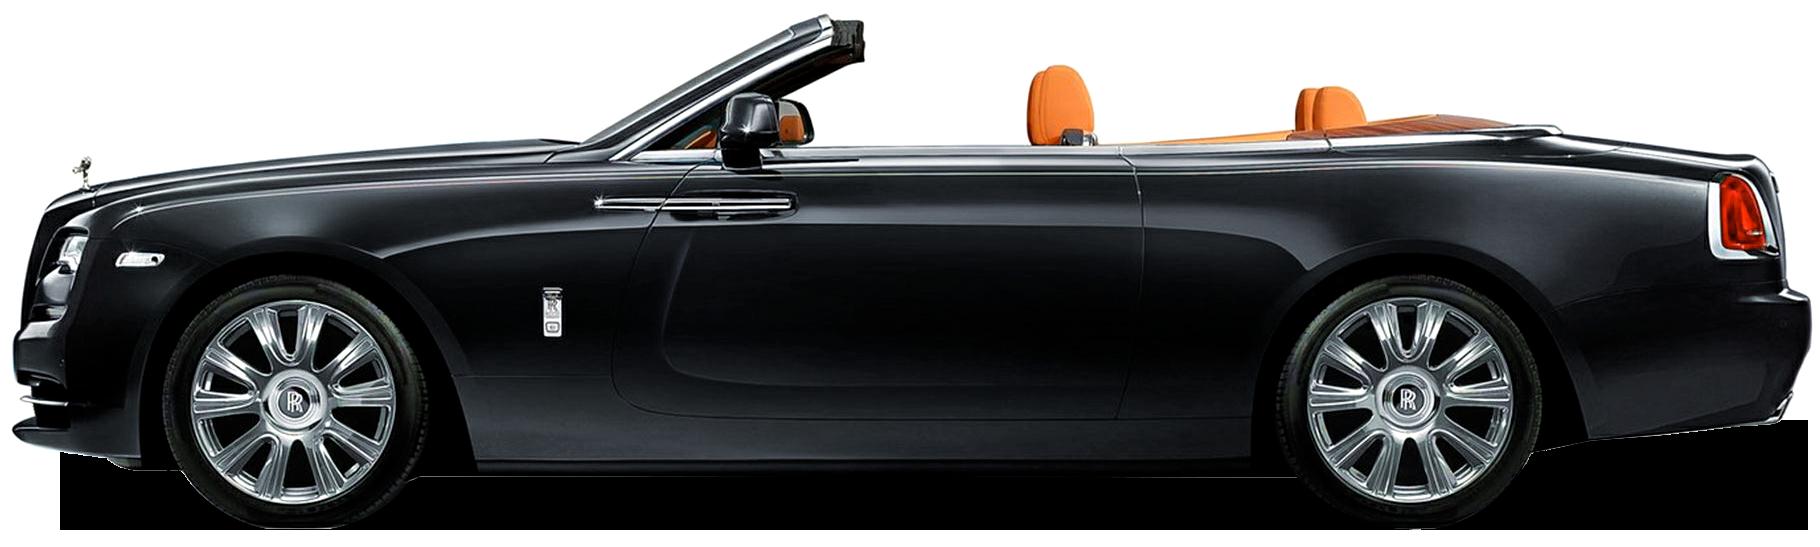 2020 Rolls-Royce Dawn Convertible